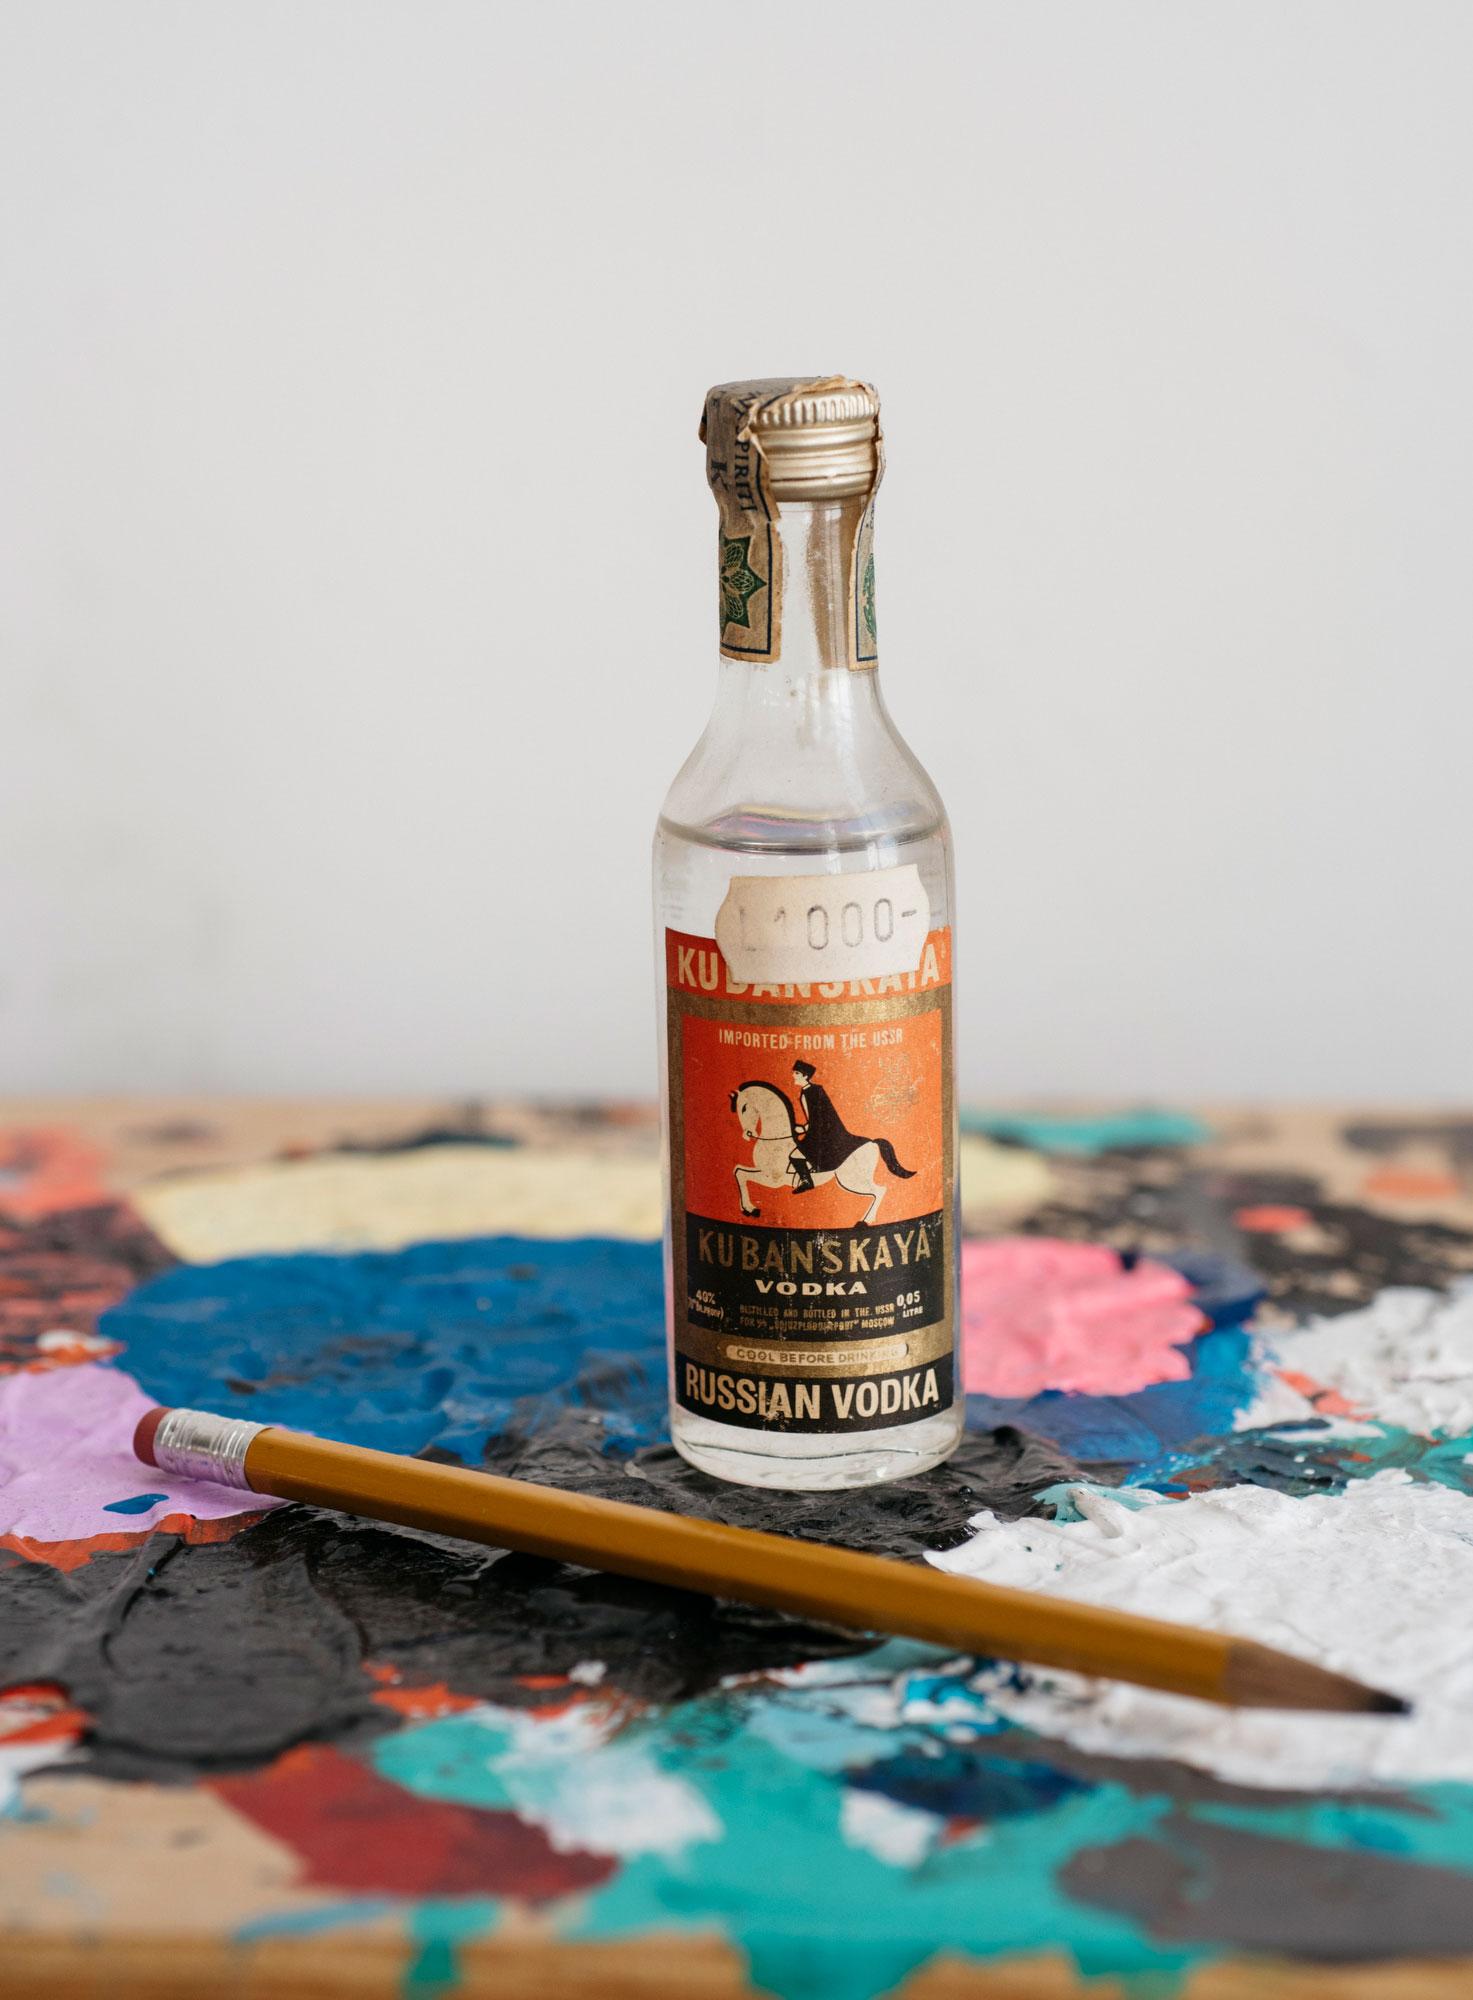 Vintage Russian Vodka Bottle